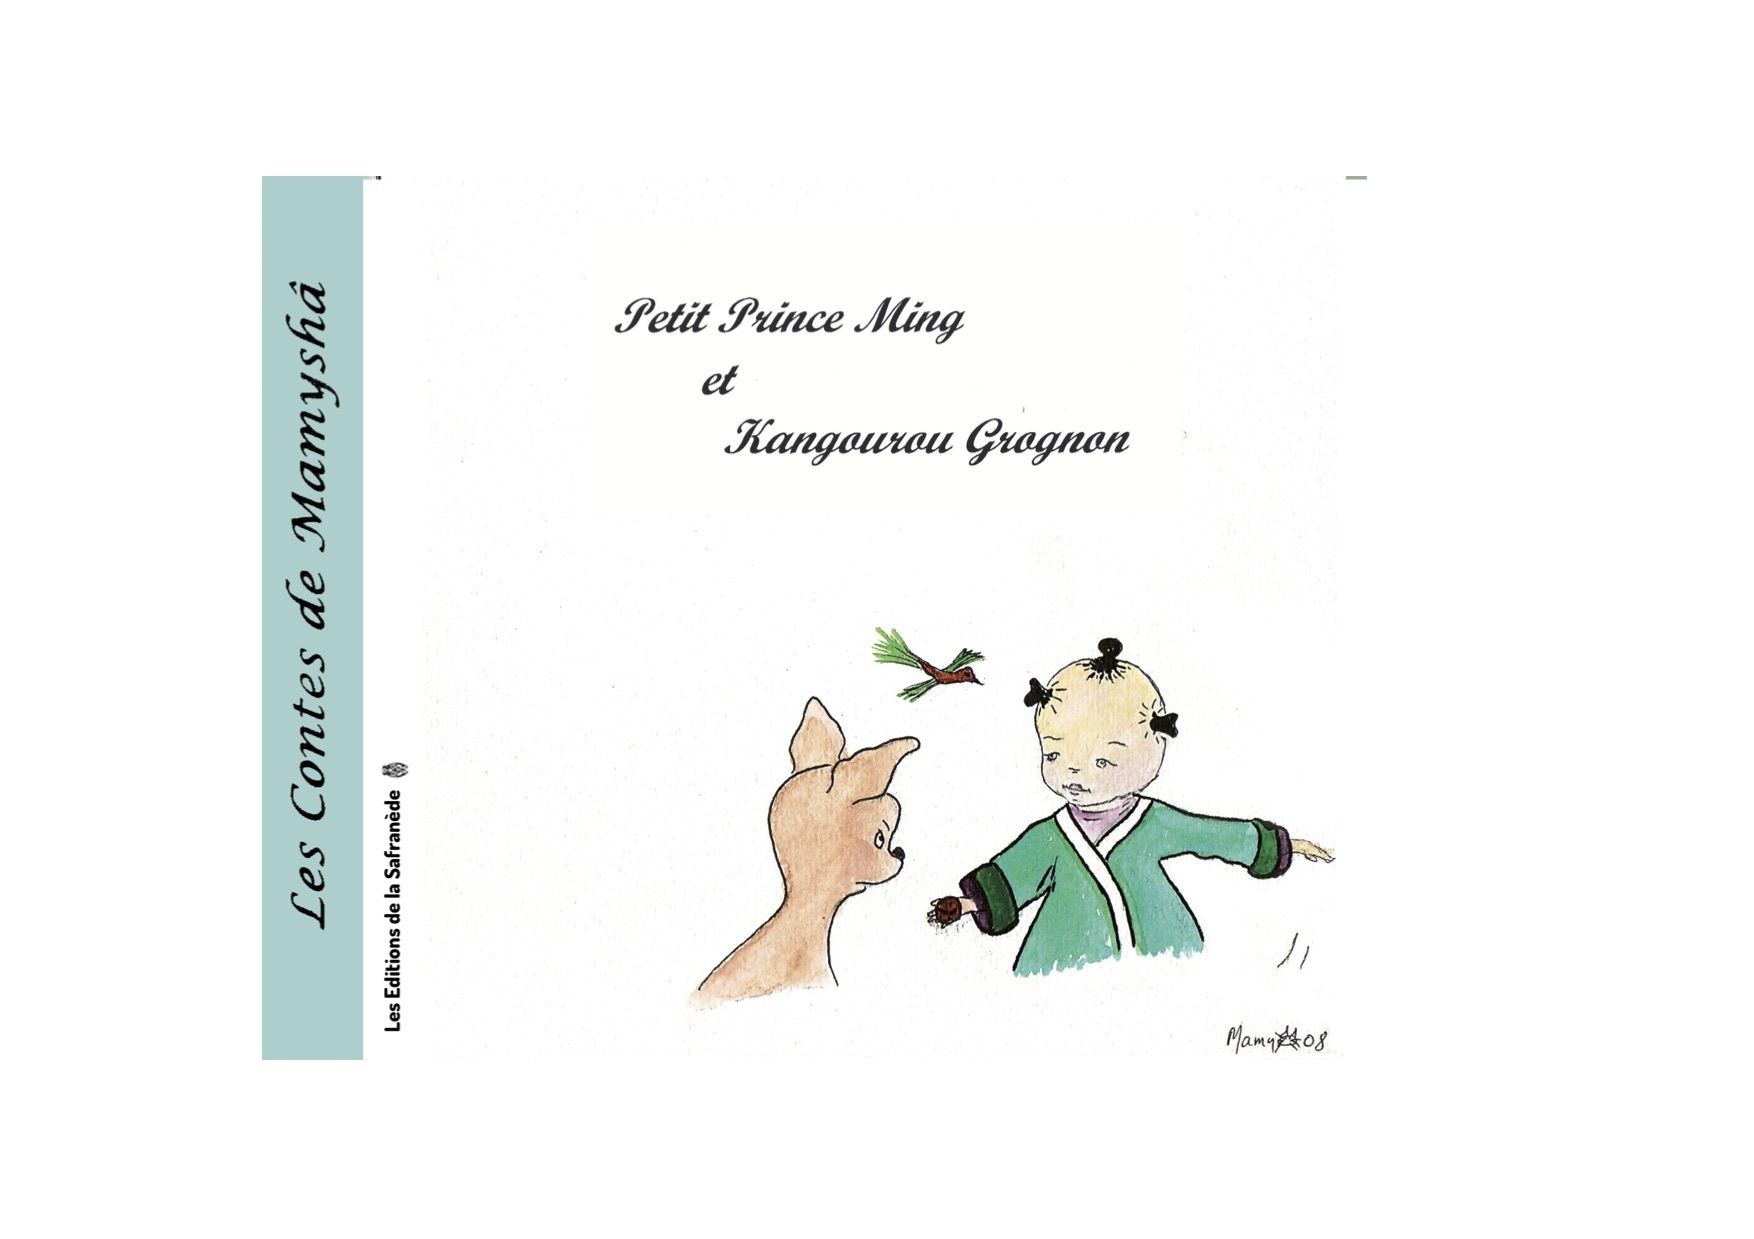 PETIT PRINCE MING ET KANGOUROU GROGNON